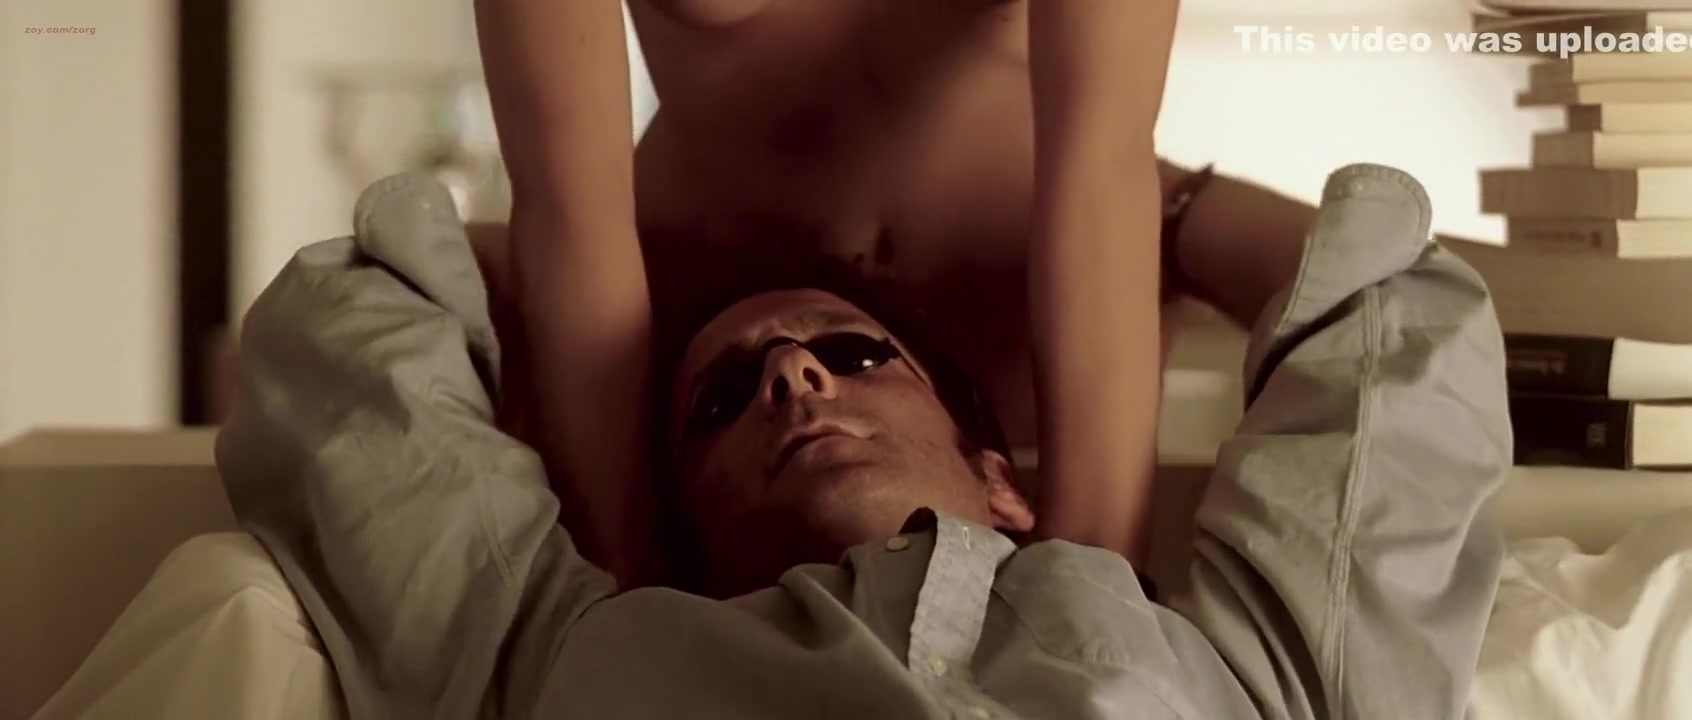 Hot Nude Megan Fox Lesbian Sex Tape